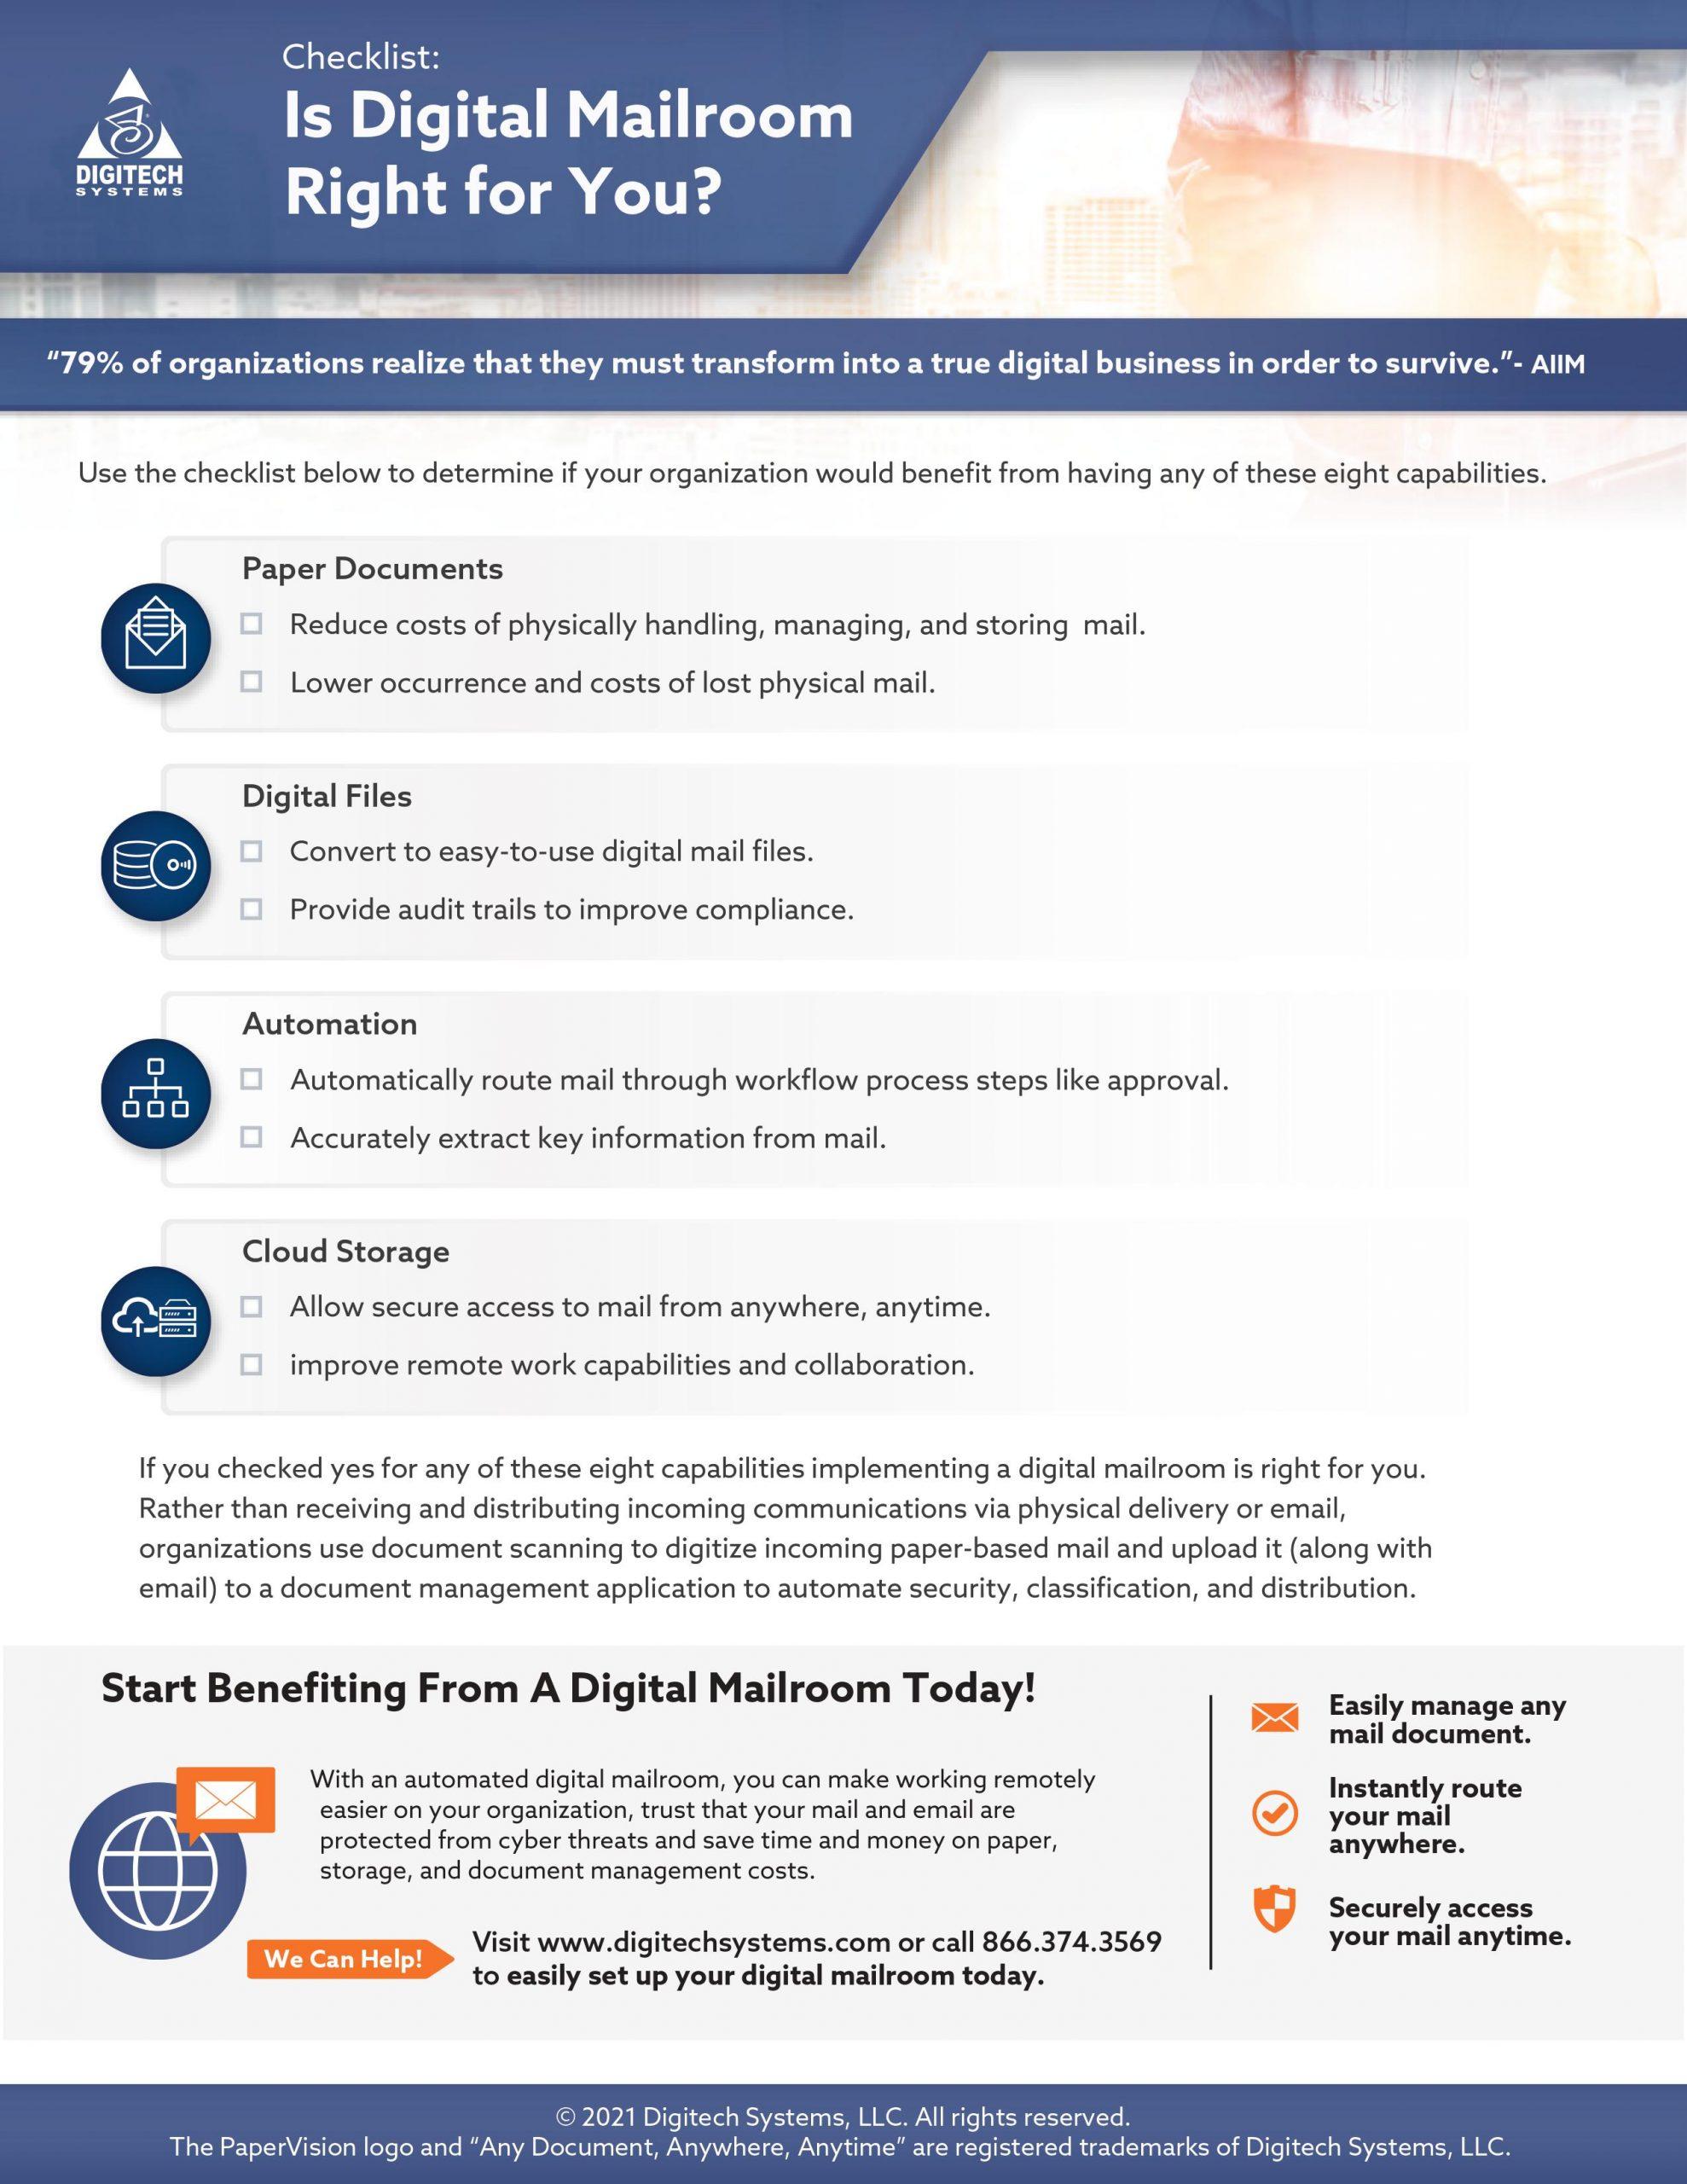 Digital-mailroom-checklist-fixed